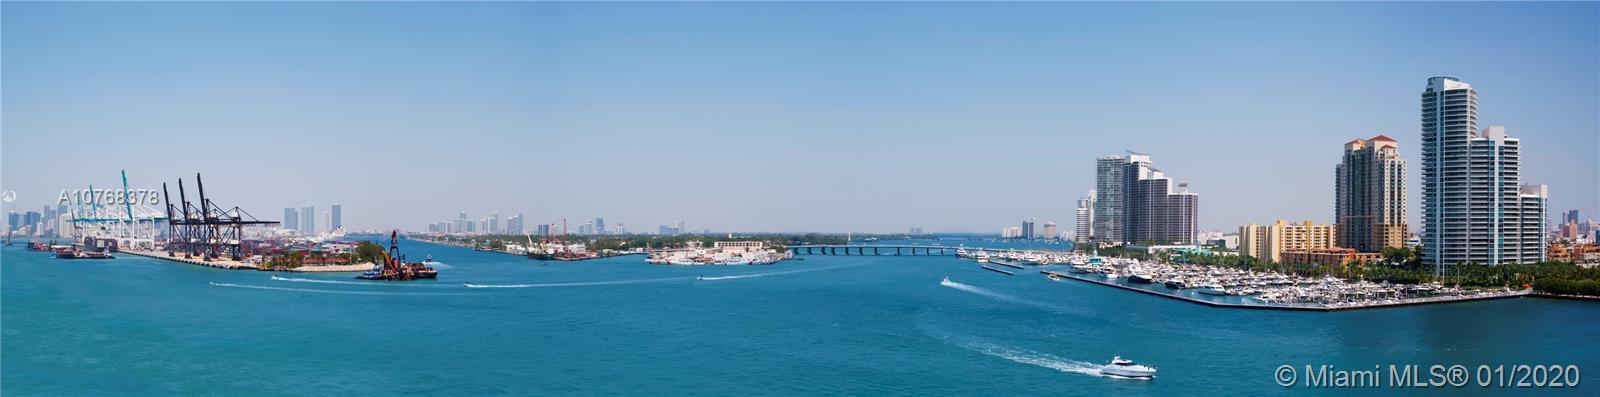 6891 Fisher Island Dr #6891, Miami Beach FL 33109